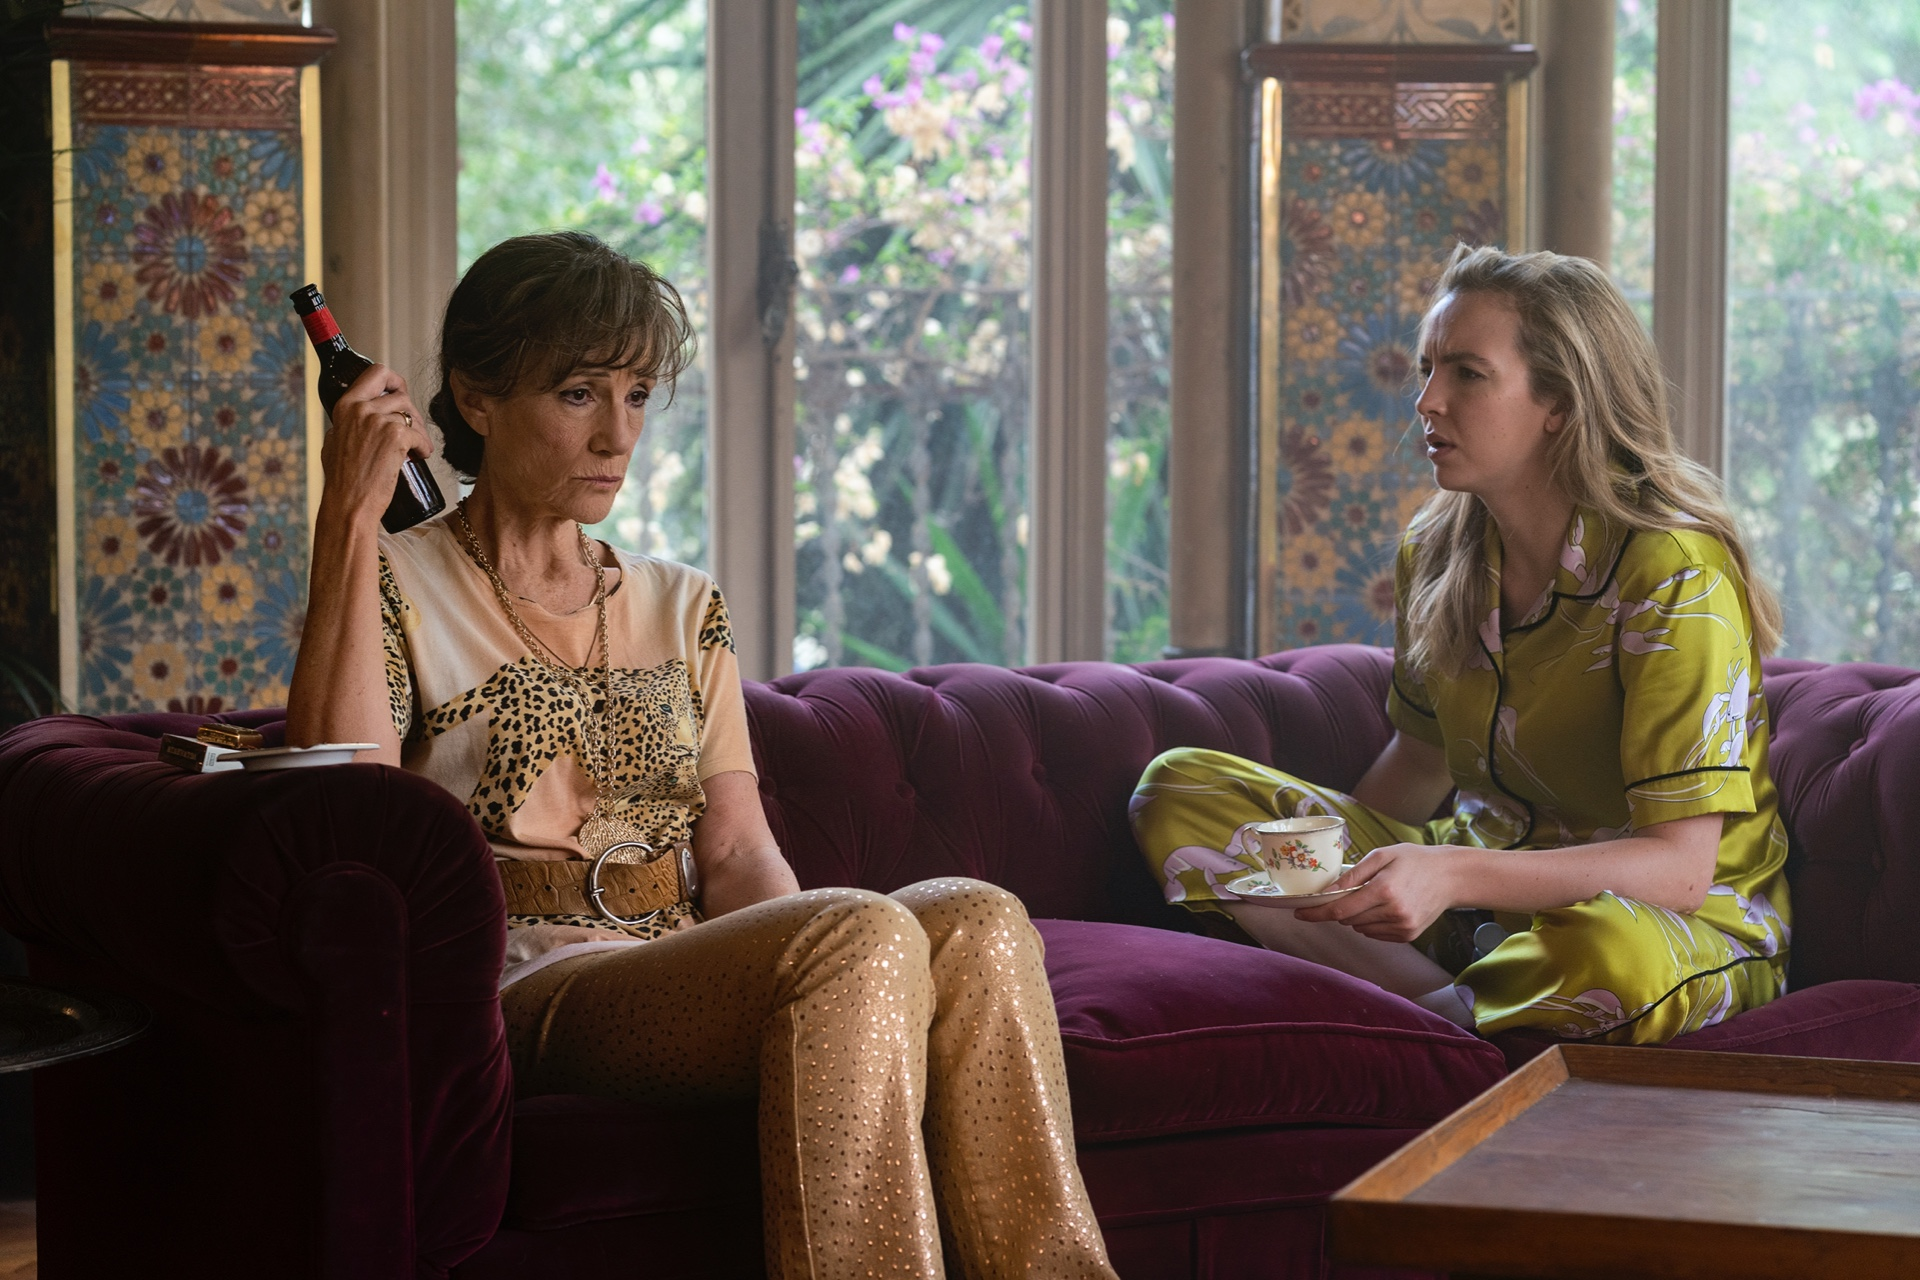 Killing Eve Season 3 Episode 2 Review: Management Sucks | Den of Geek